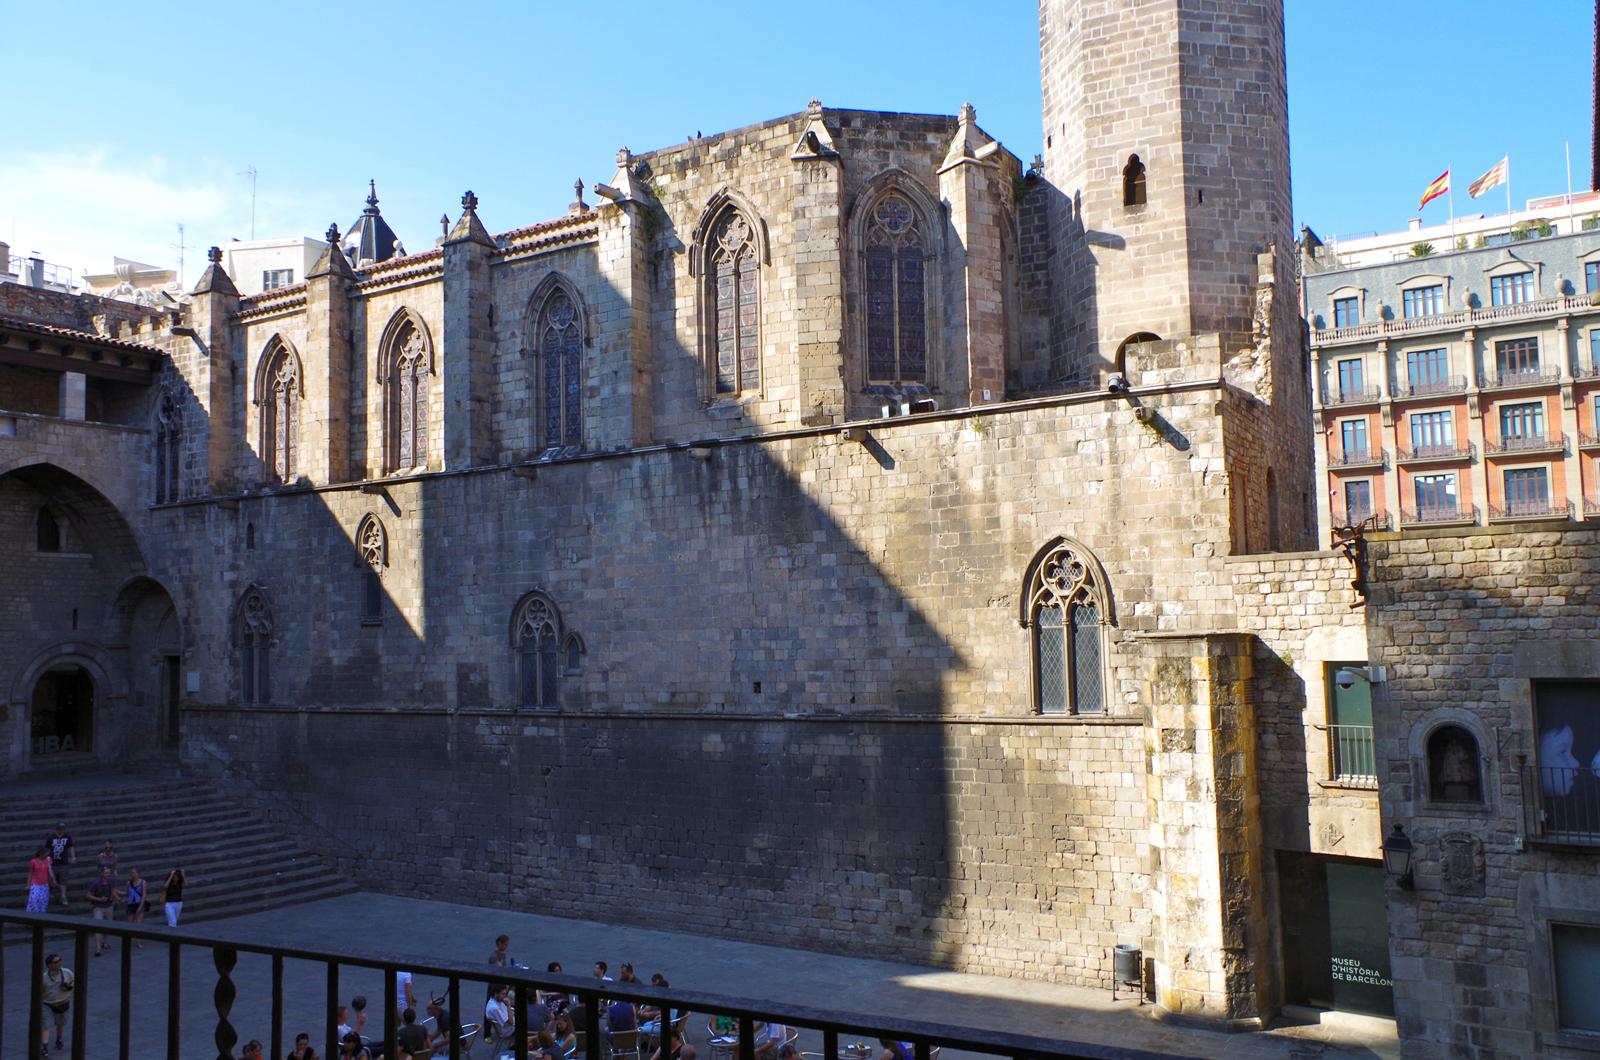 Casa modernista pla a del rei golden arts - Casa luthier barcelona ...